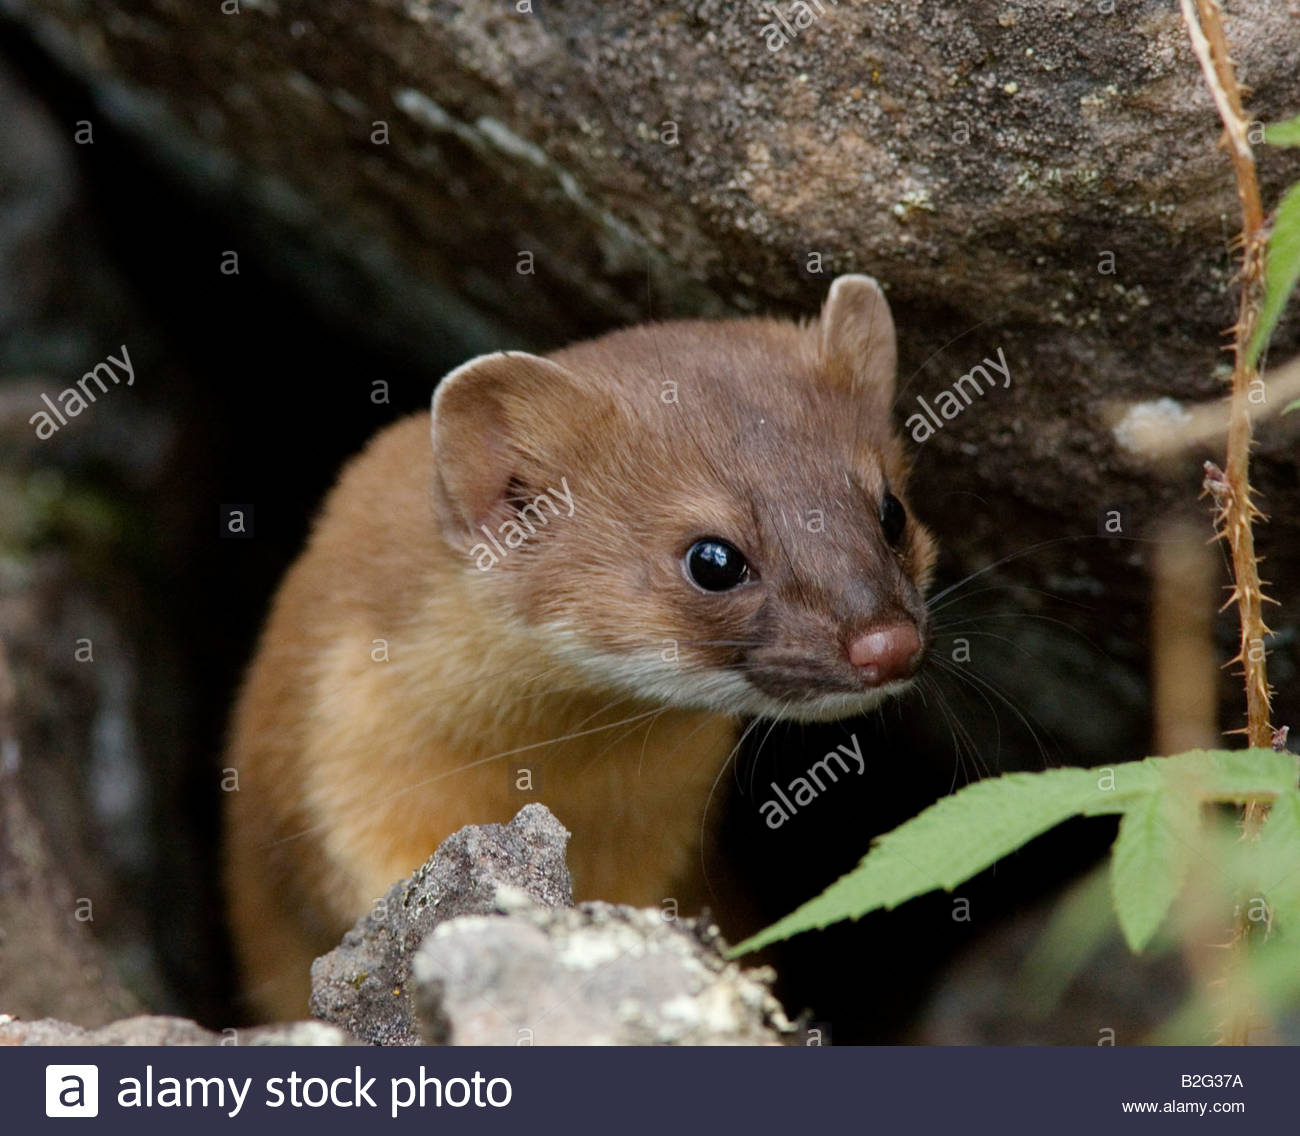 long-tailed-weasel-mustela-frenata-B2G37A.jpg